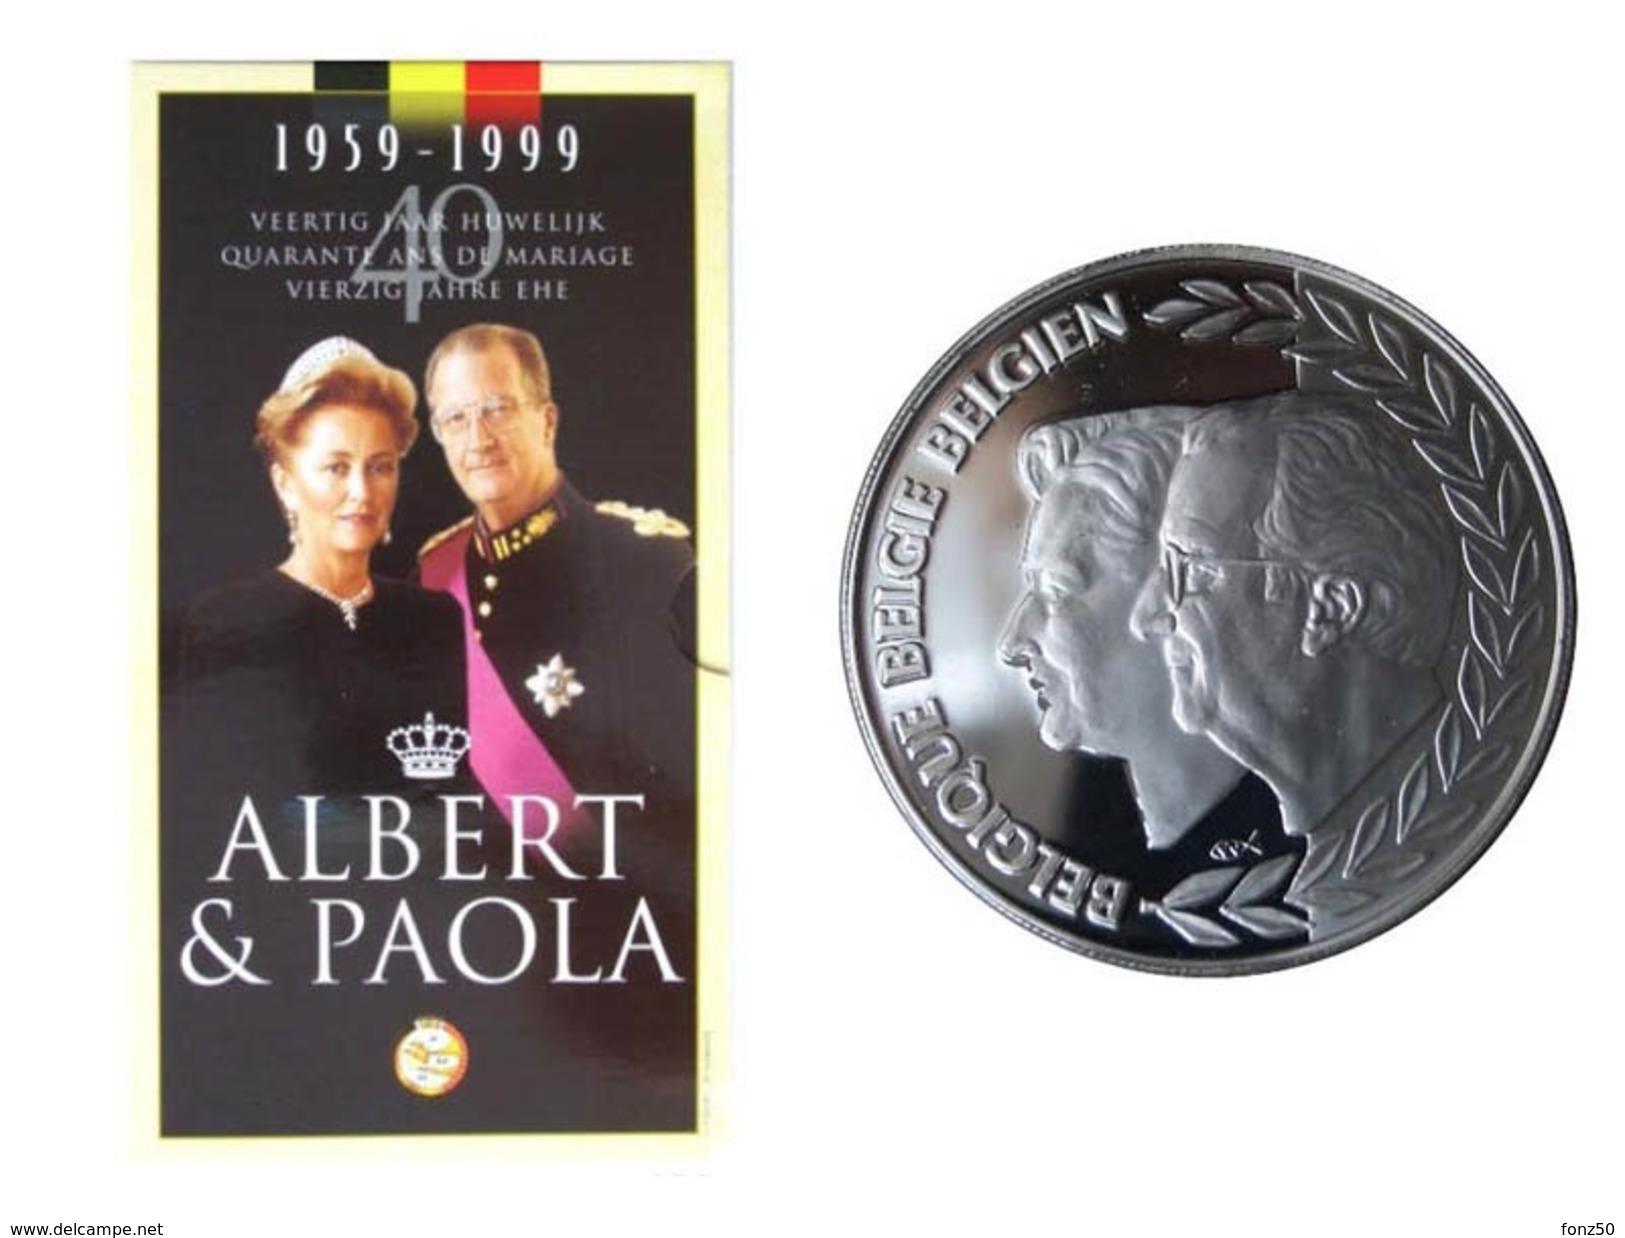 ALBERT II * 250 Frank 1999    ALBERT & PAOLA * QP - BLISTER * Nr 9716 - 07. 250 Francs